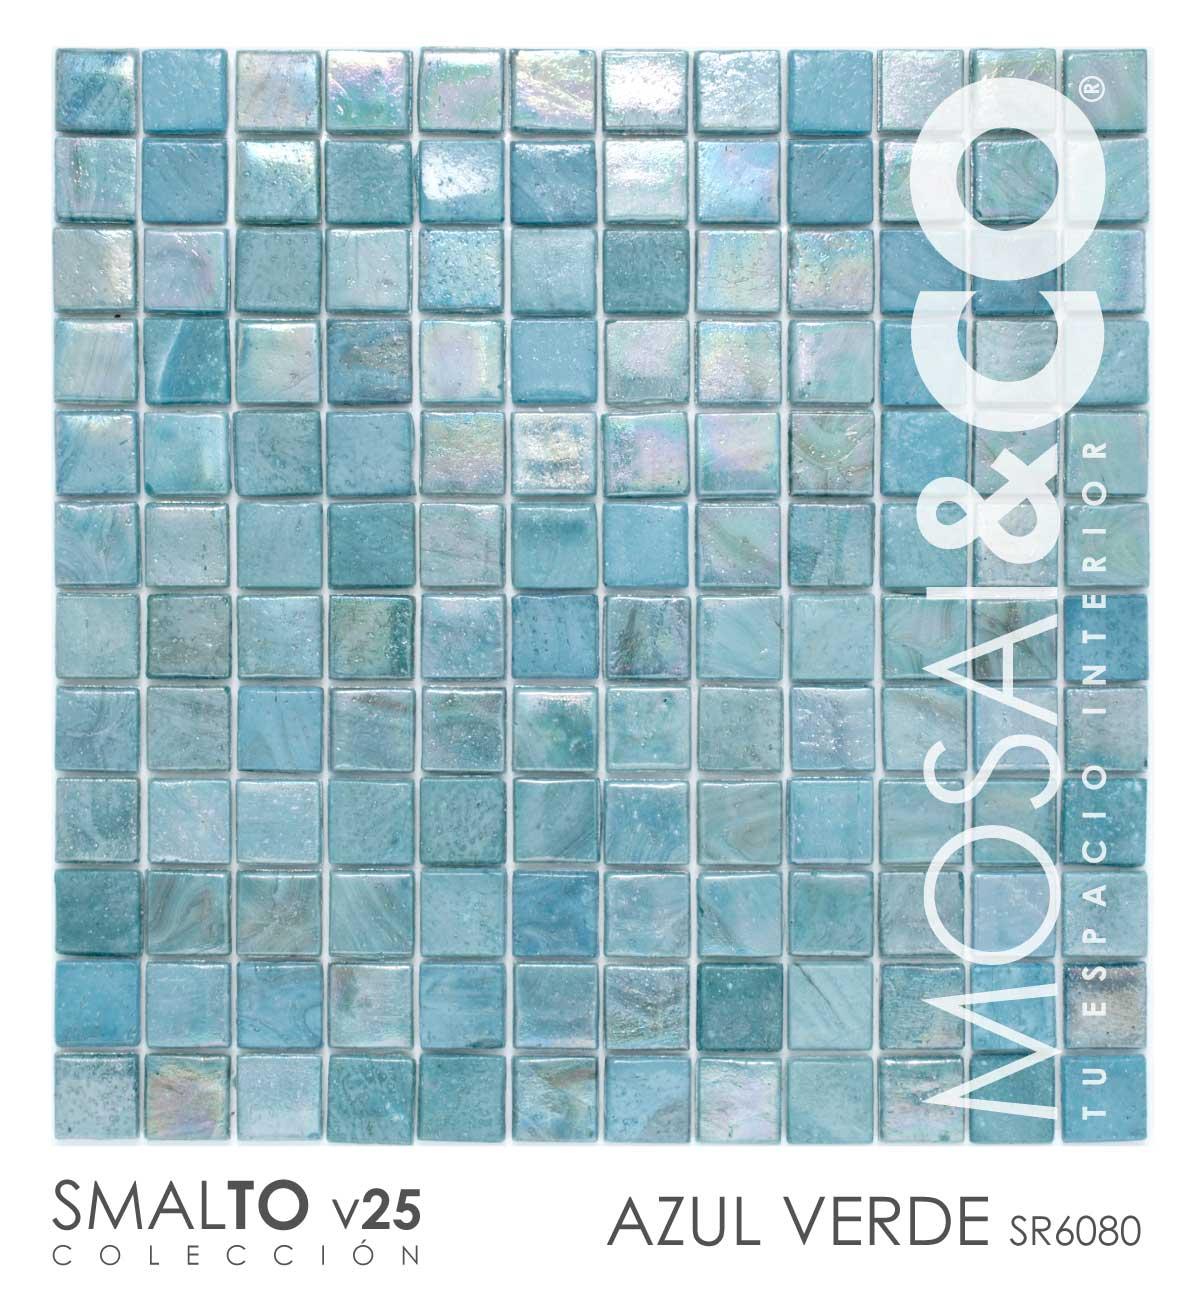 mosaico-interiores-mosaiandco-smalto-v25-azulverde-sr6080